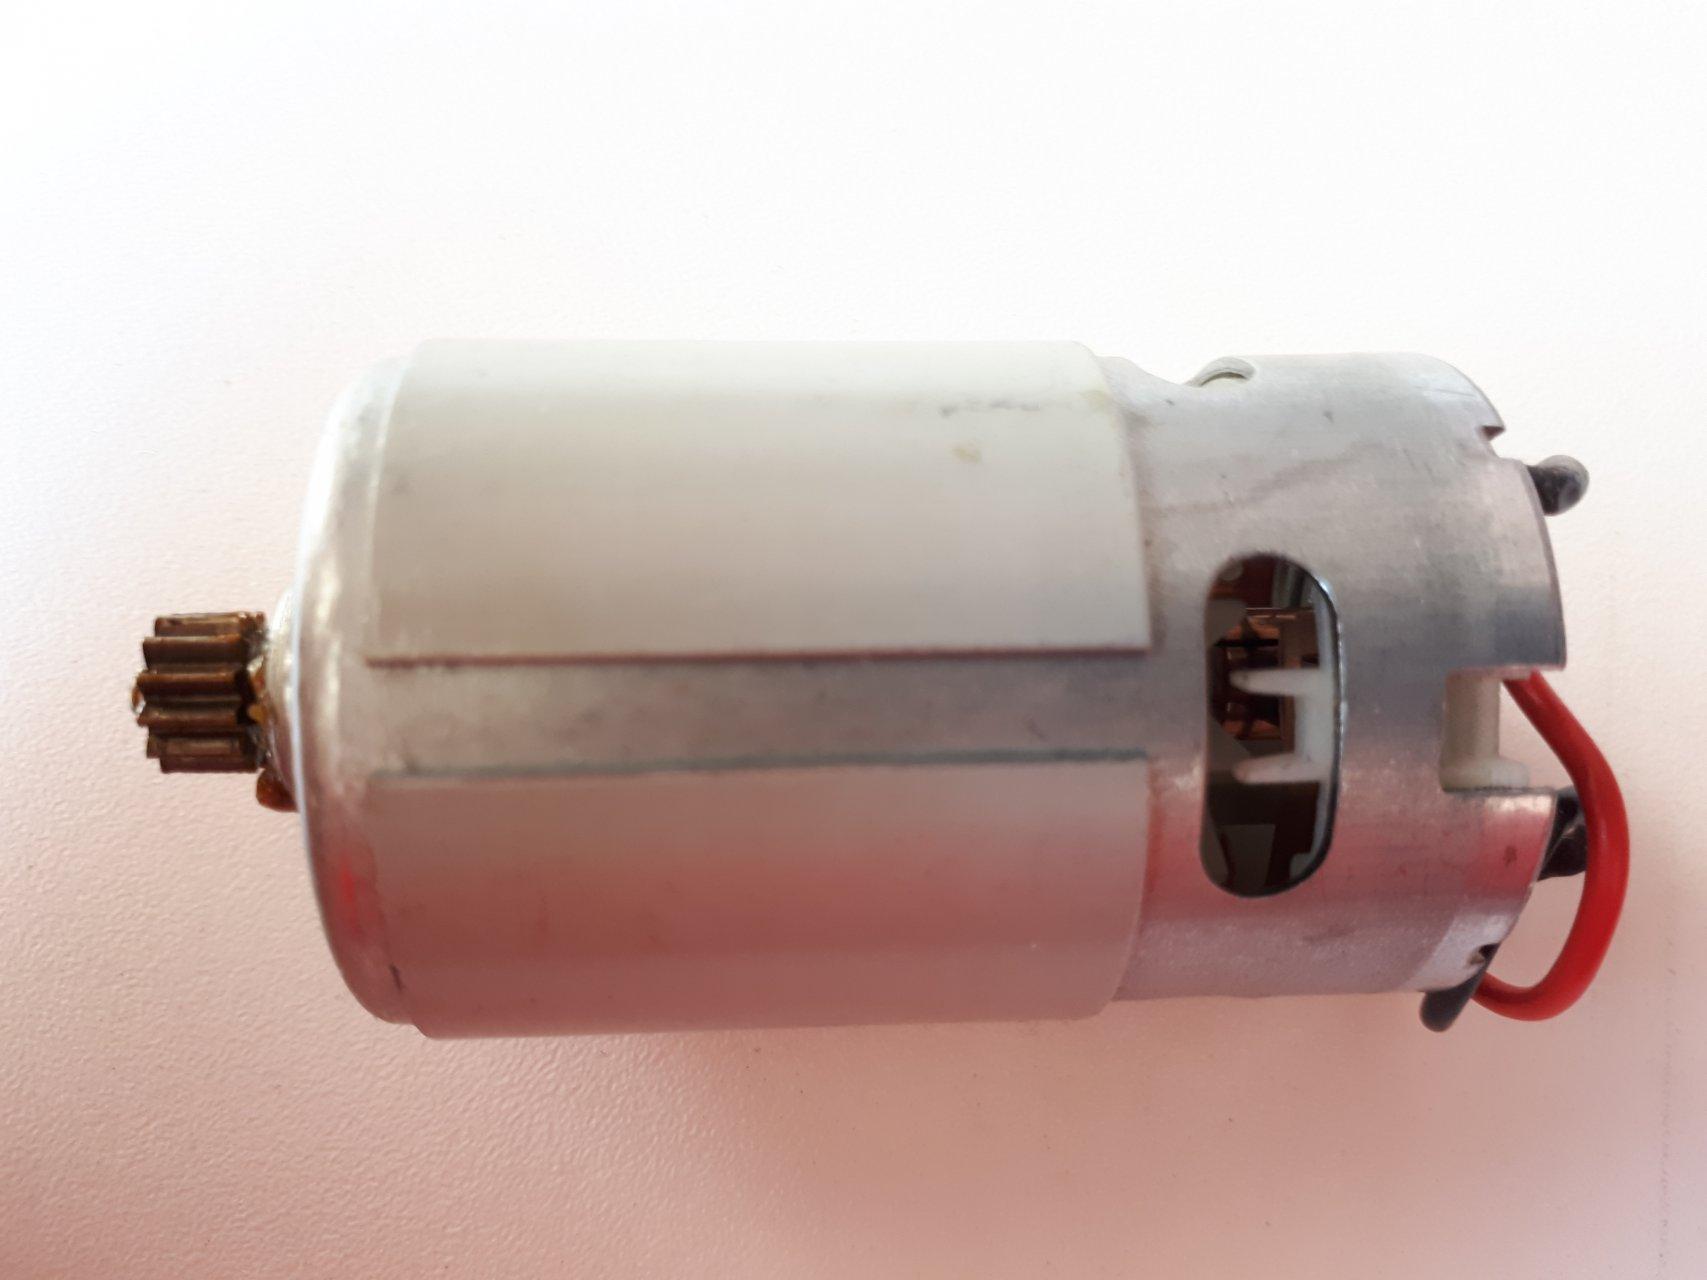 موتور دریل شارژی ادون